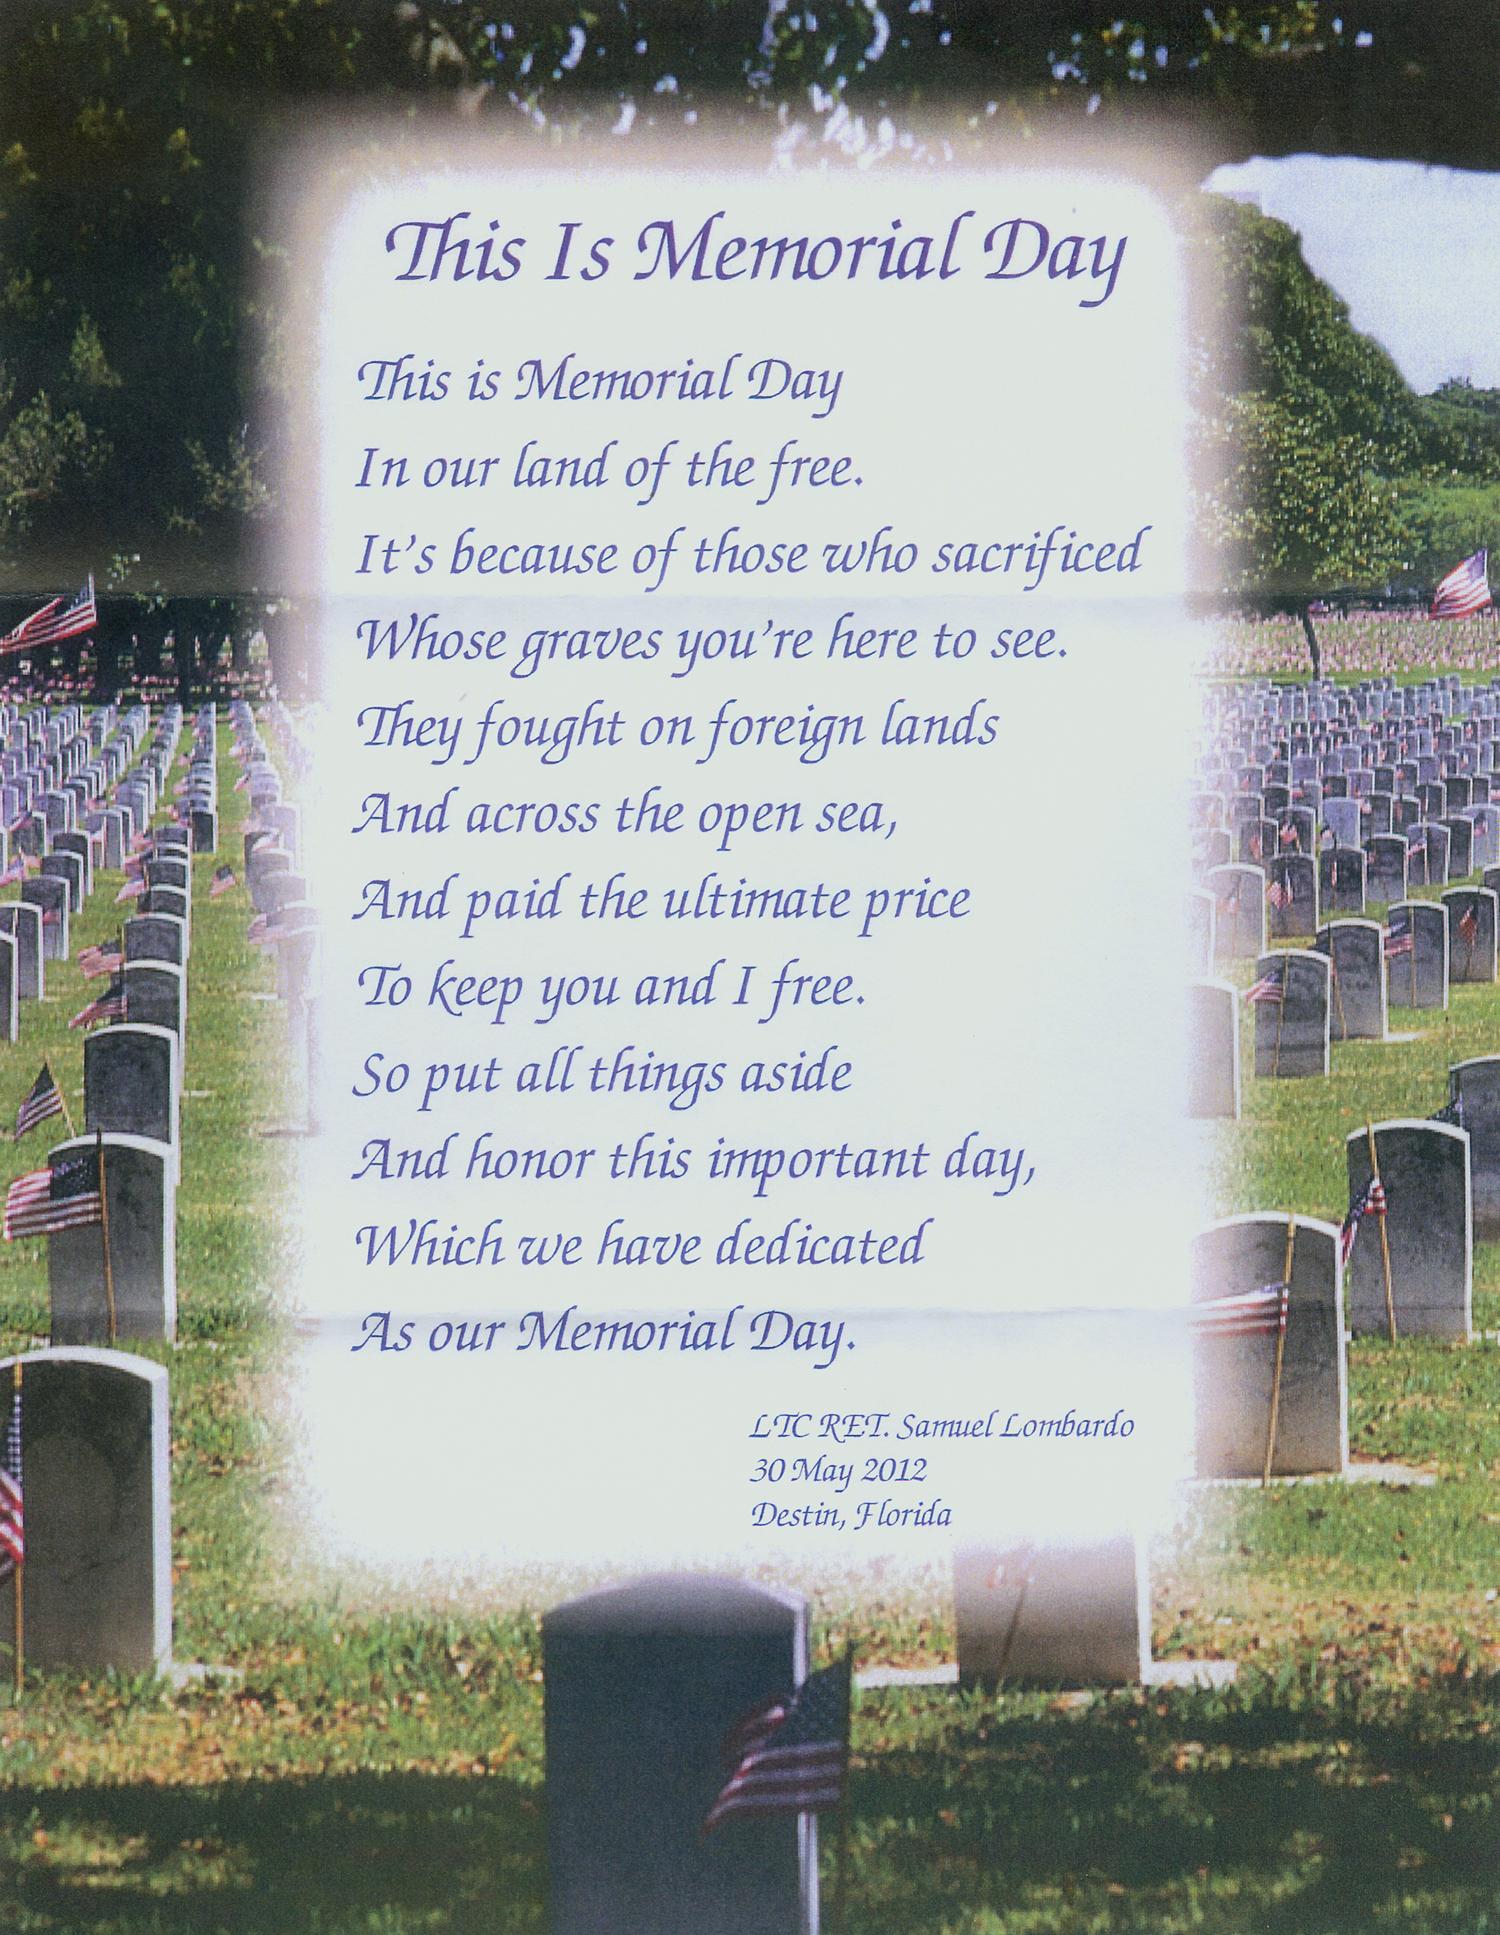 This Is Memorial Day Poem Prayer